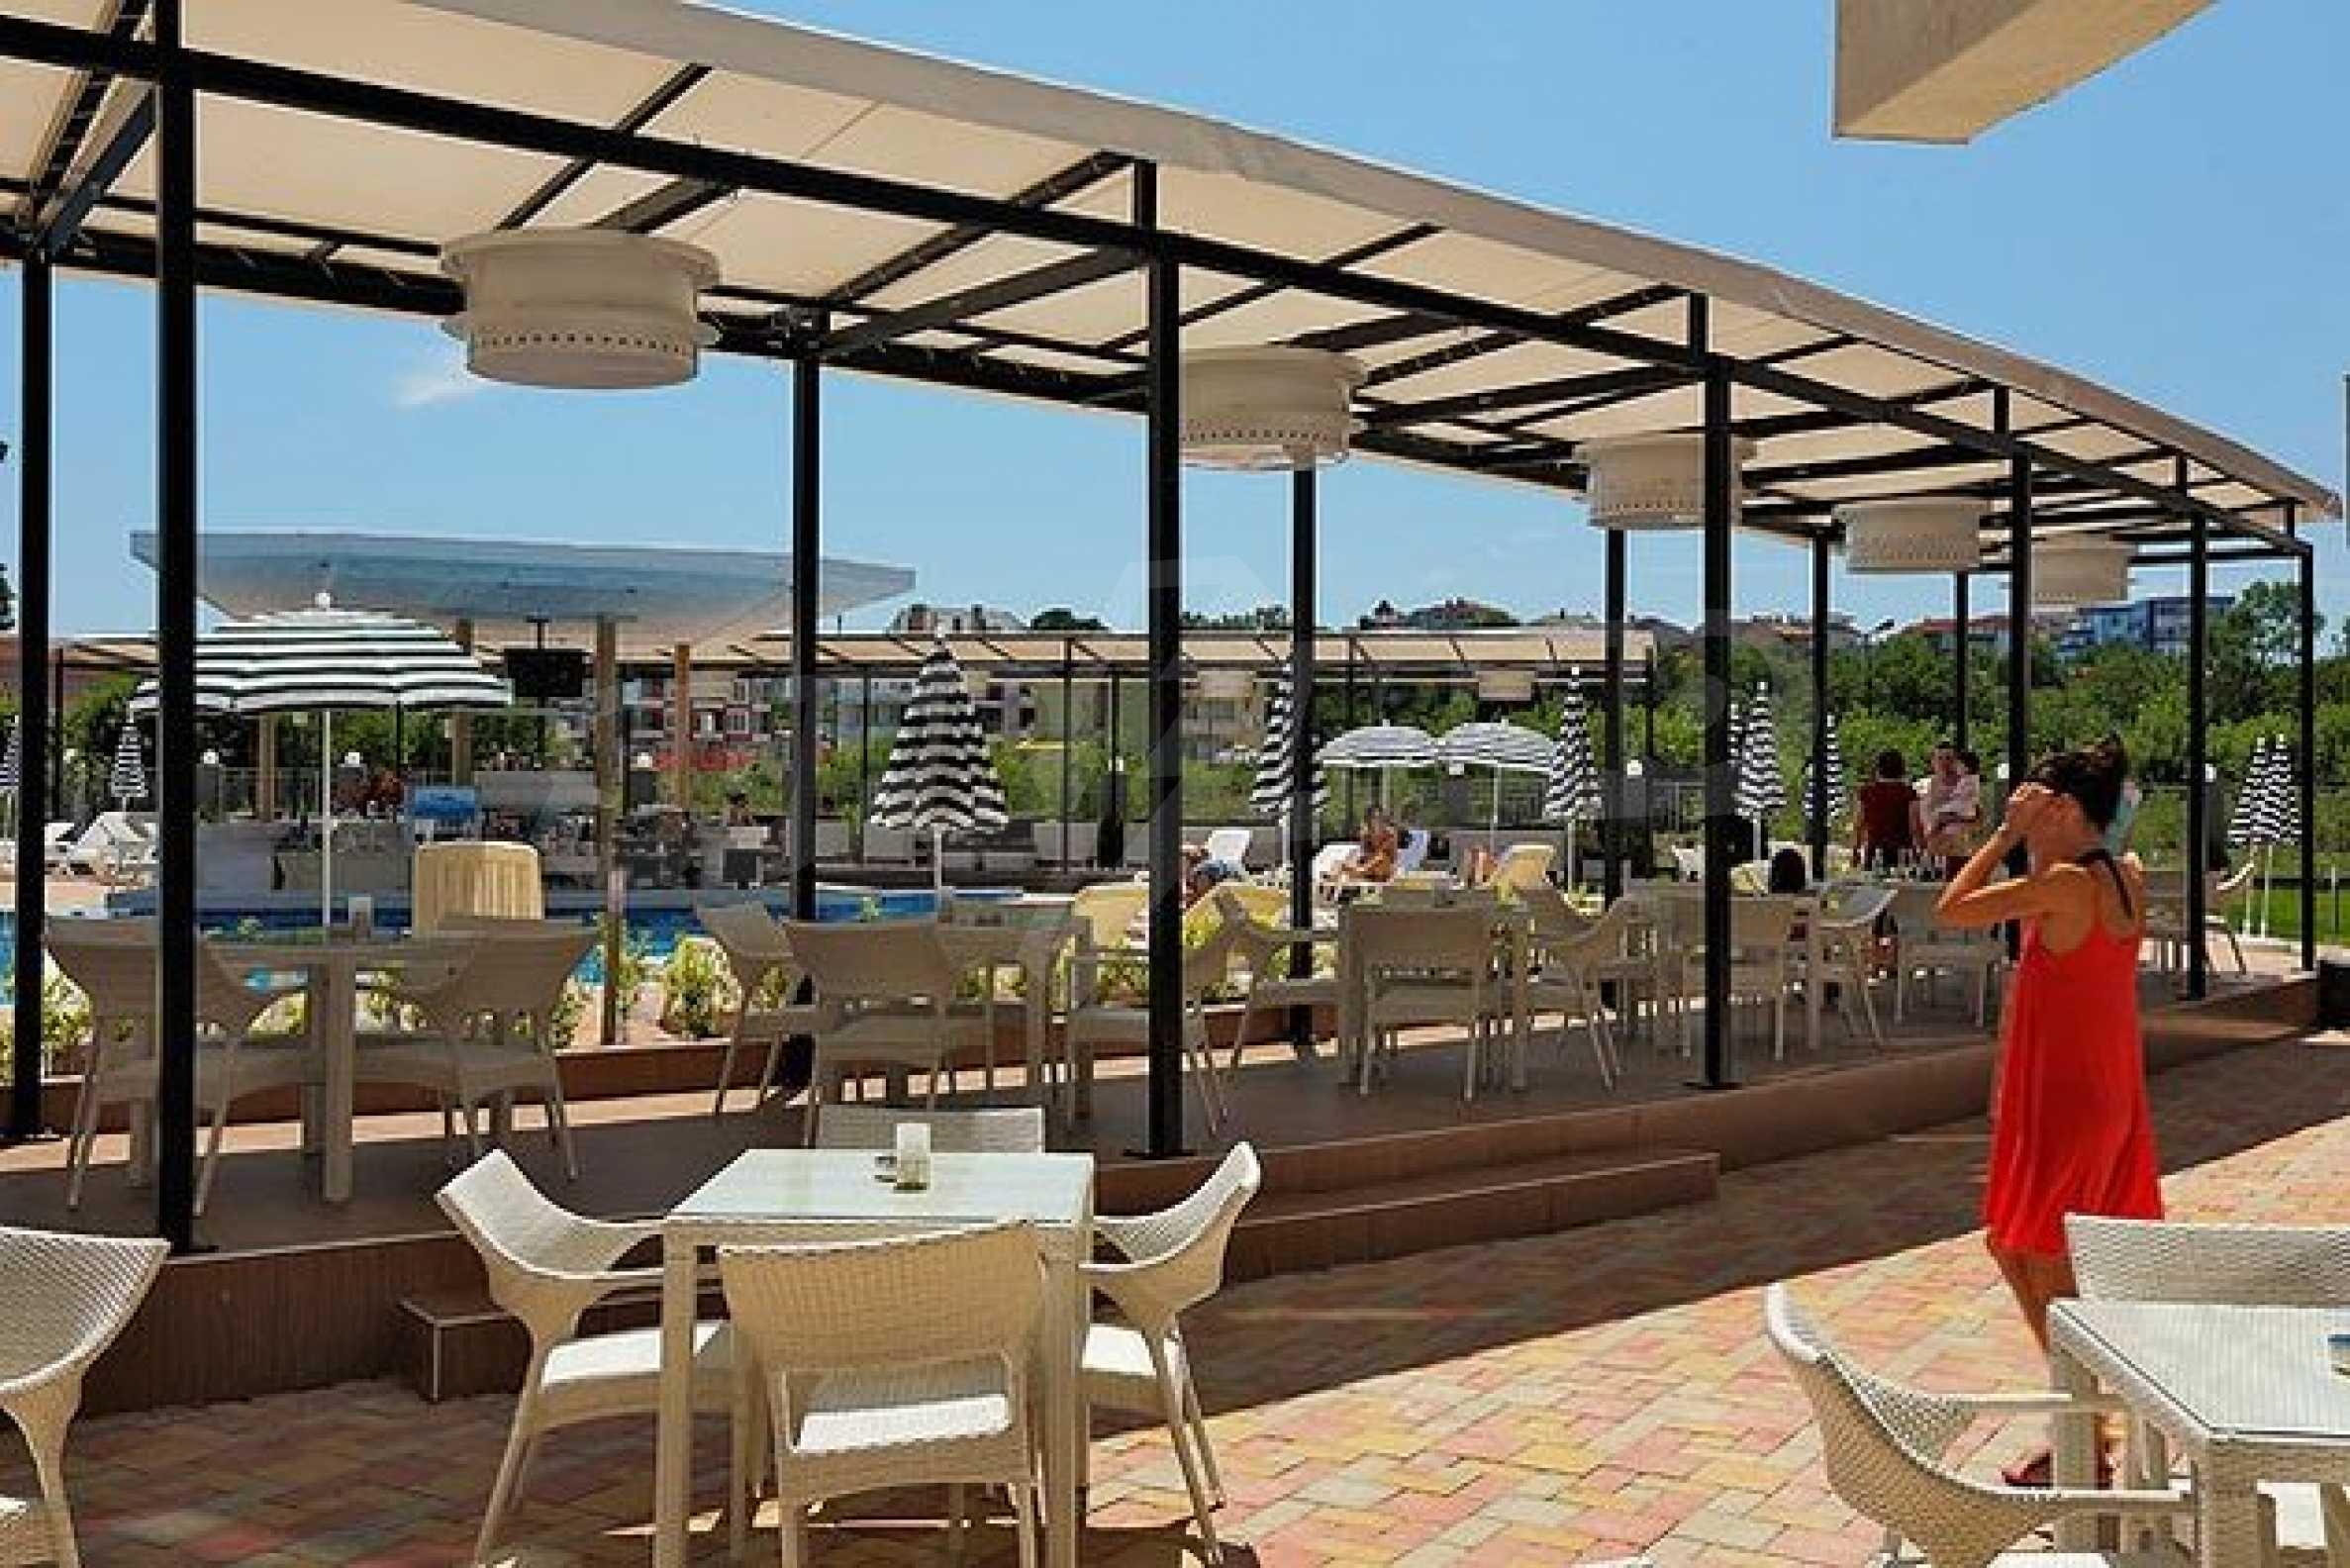 Emberli Park Bar & Diner in the beach resort of Lozenets 19